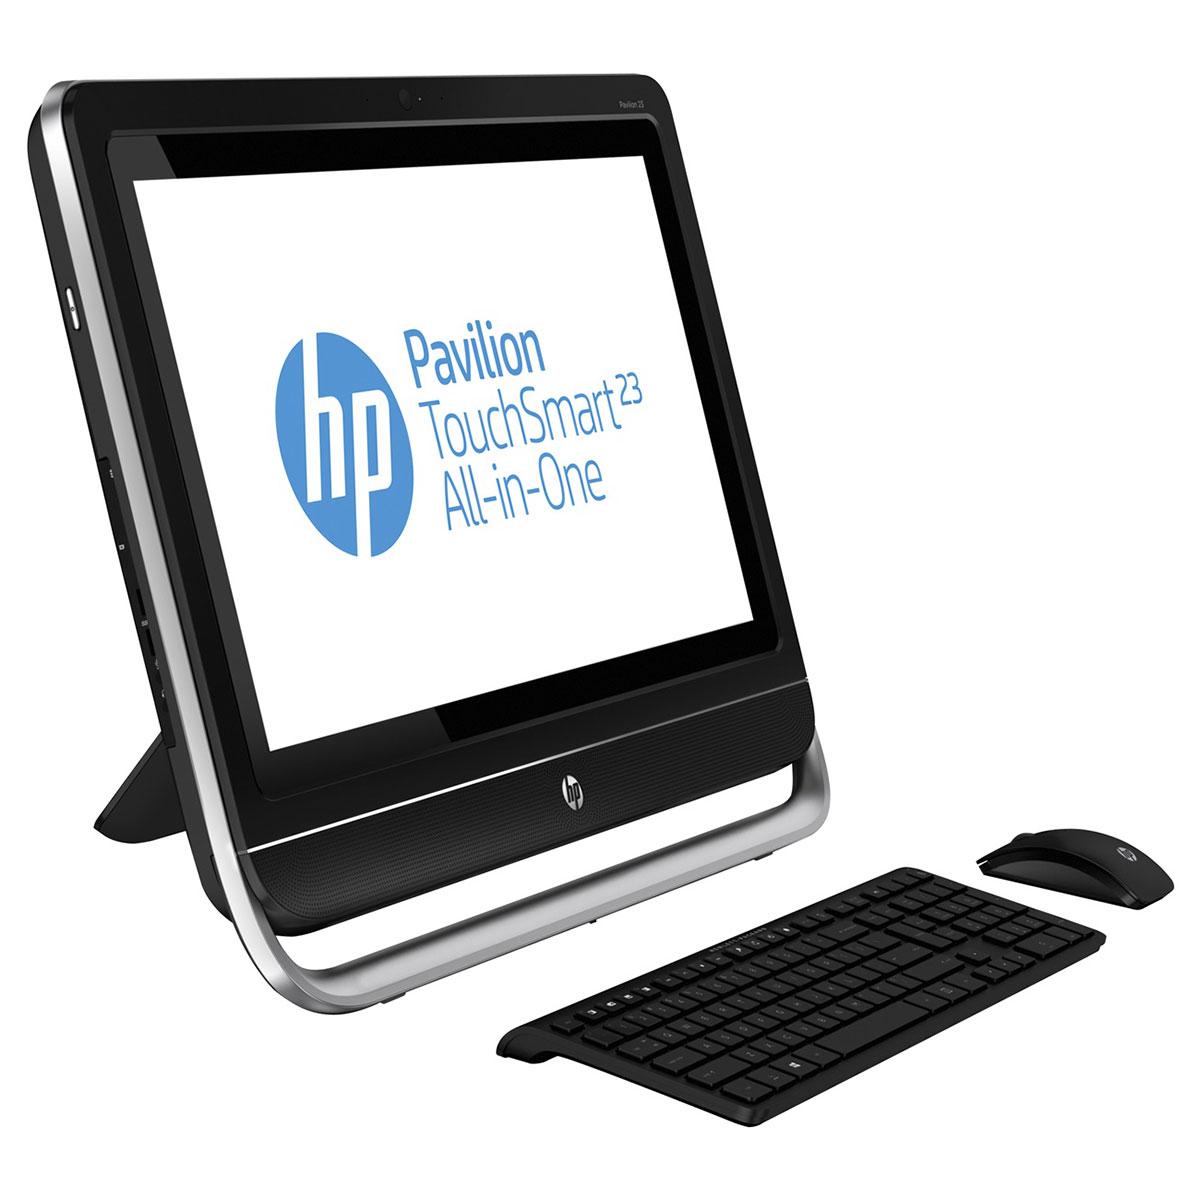 HP Pavilion TouchSmart 23 F340ef E8T69EA